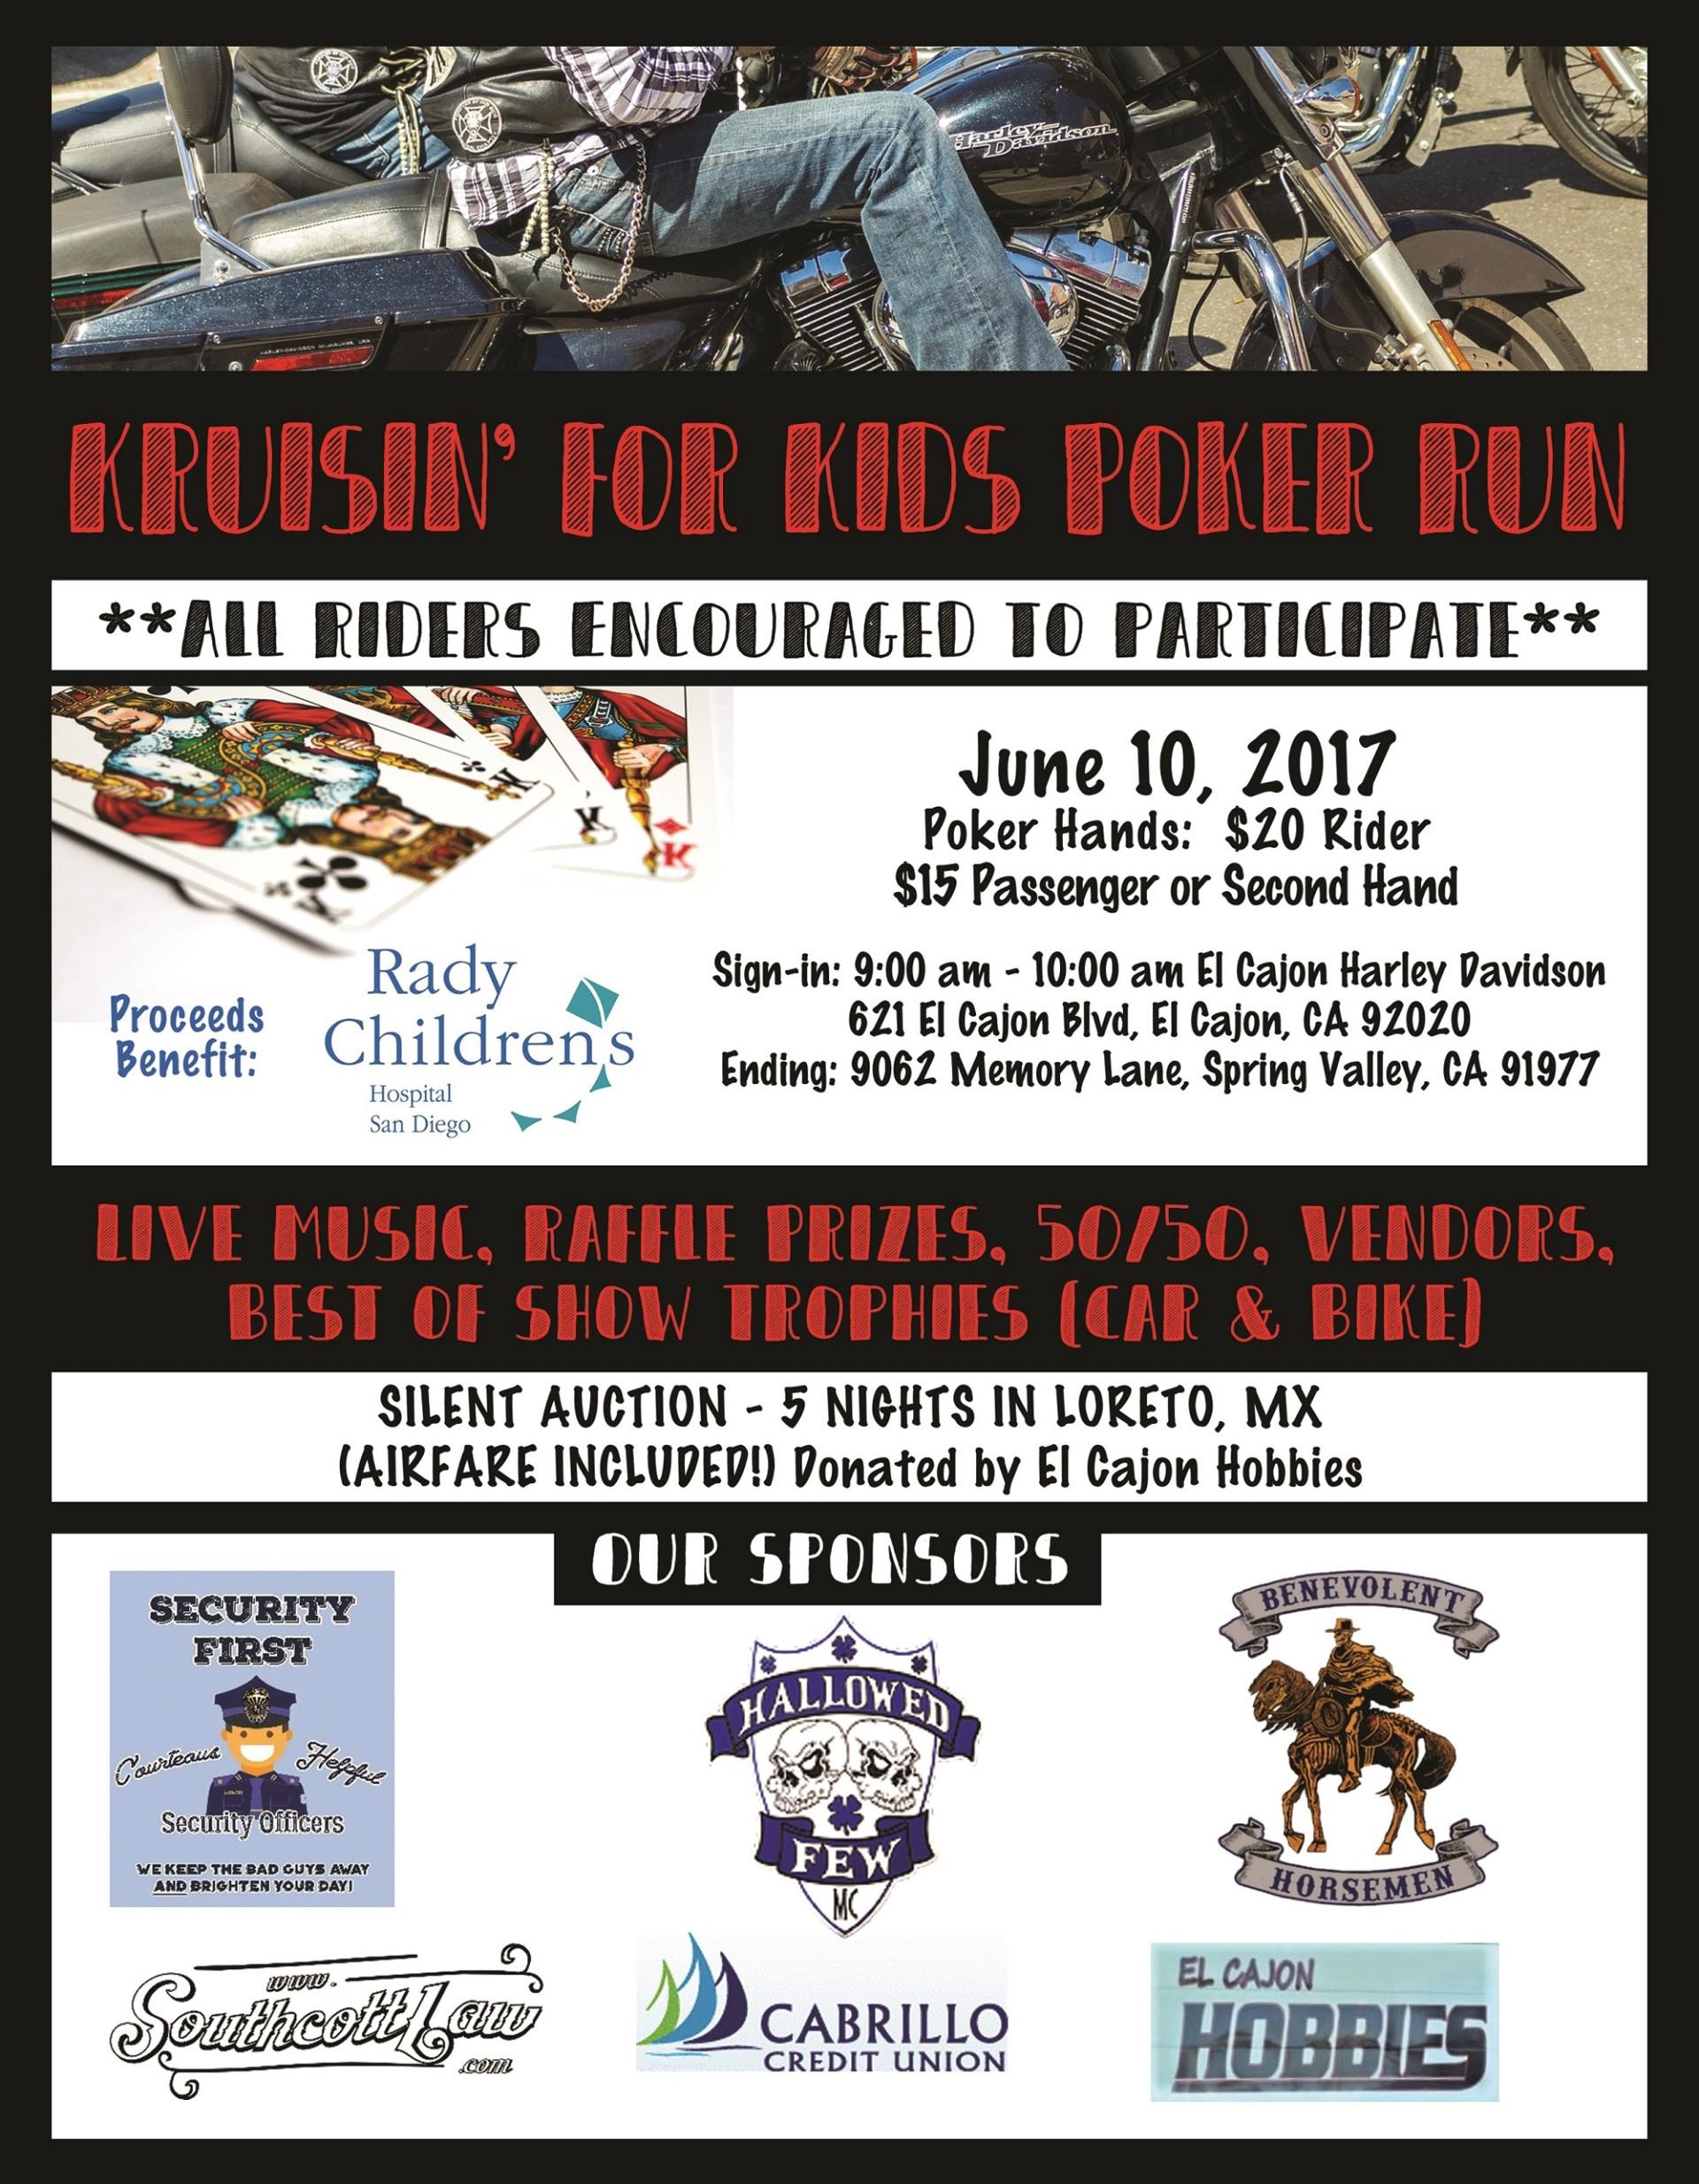 Poker-run-comes-to-Alpine-June-2017-w1920.jpg